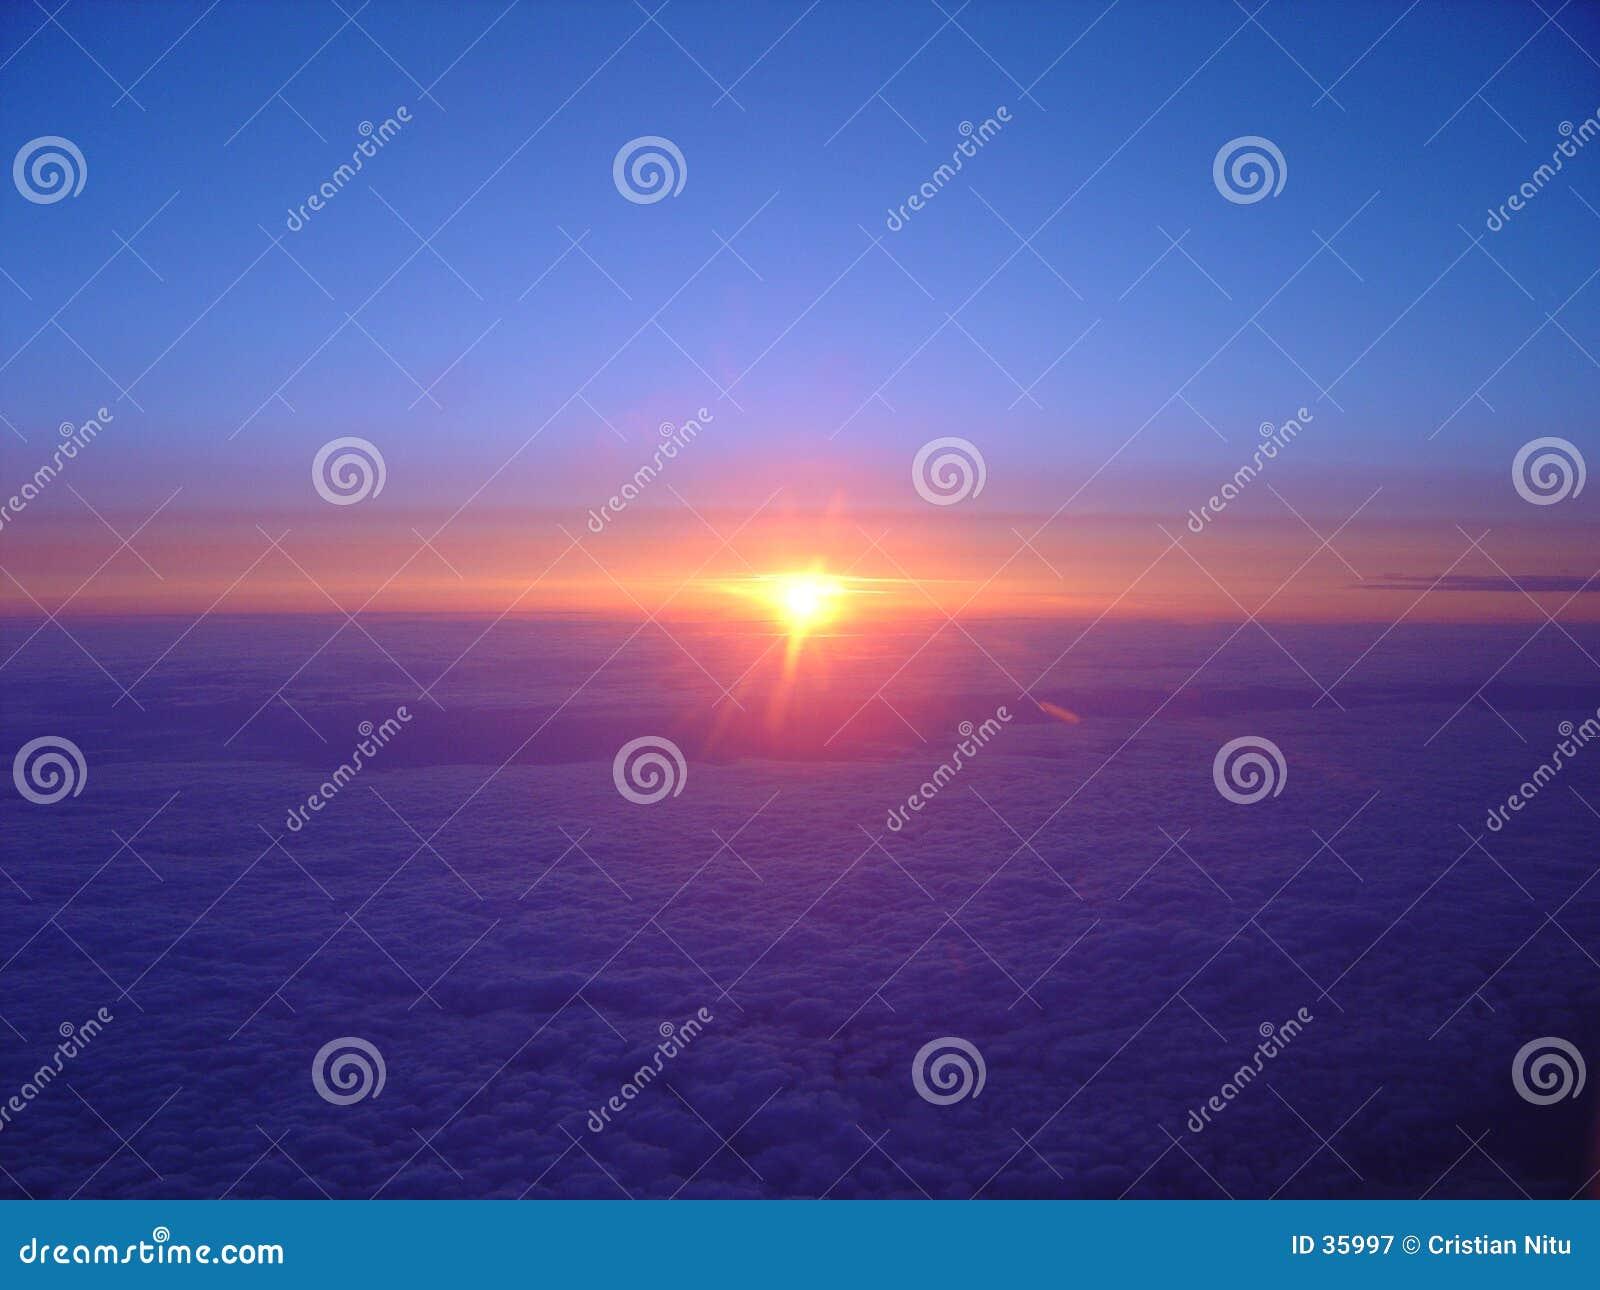 Cloudy Flying Sunrise